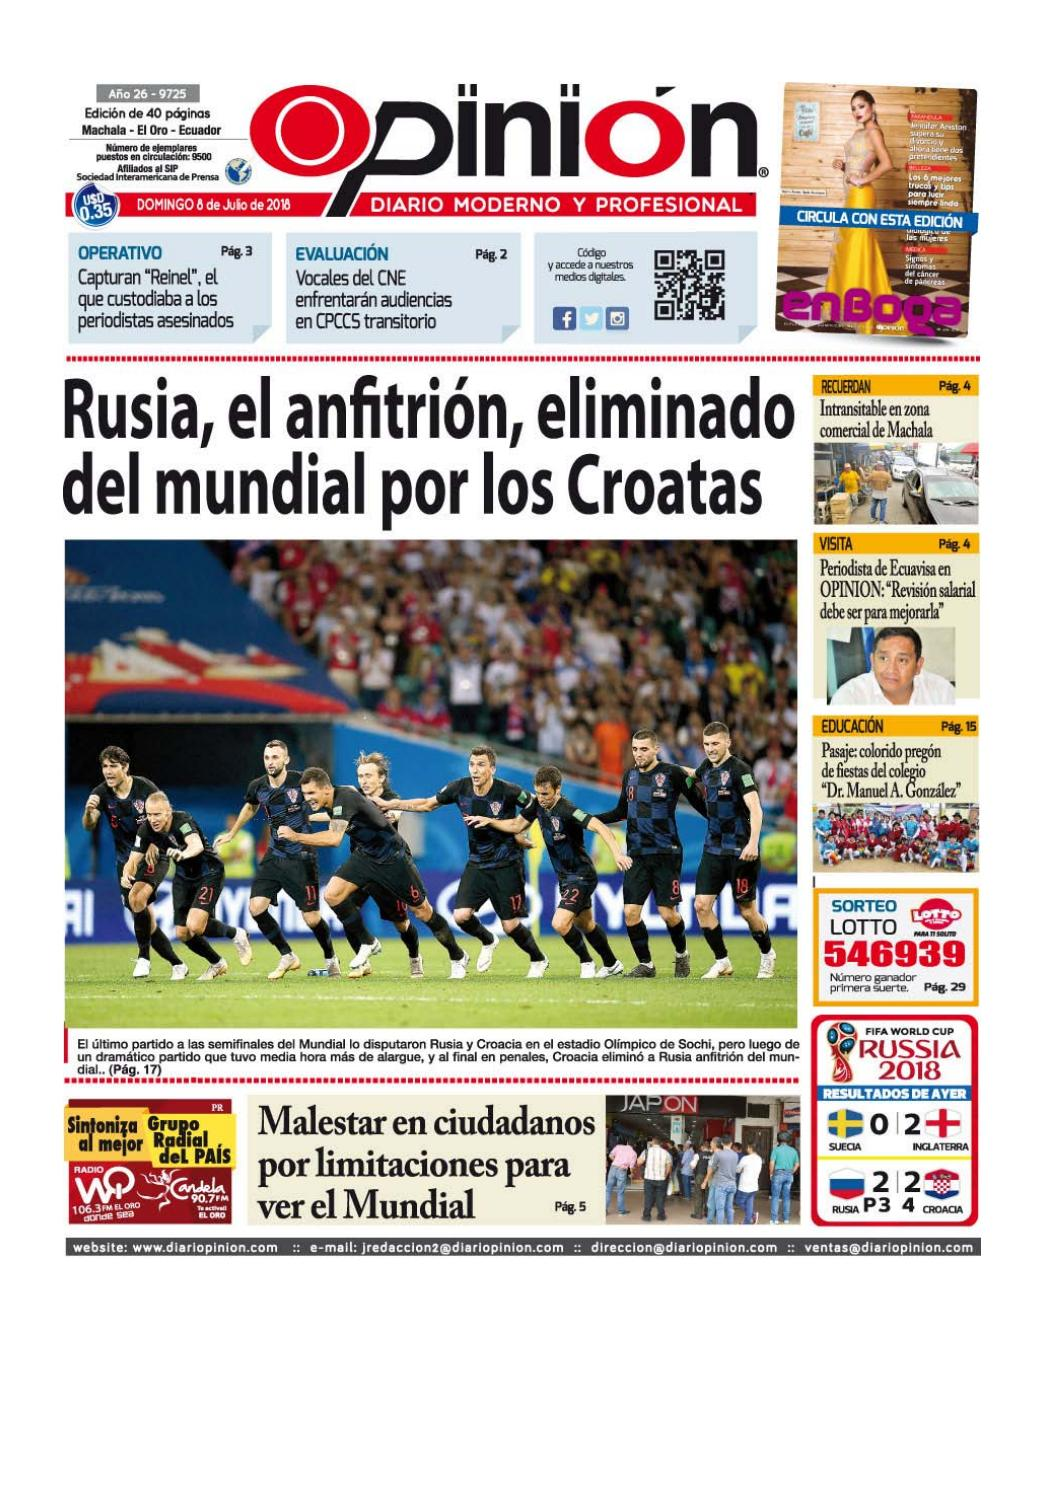 Impreso 08 07 18 by Diario Opinion - issuu